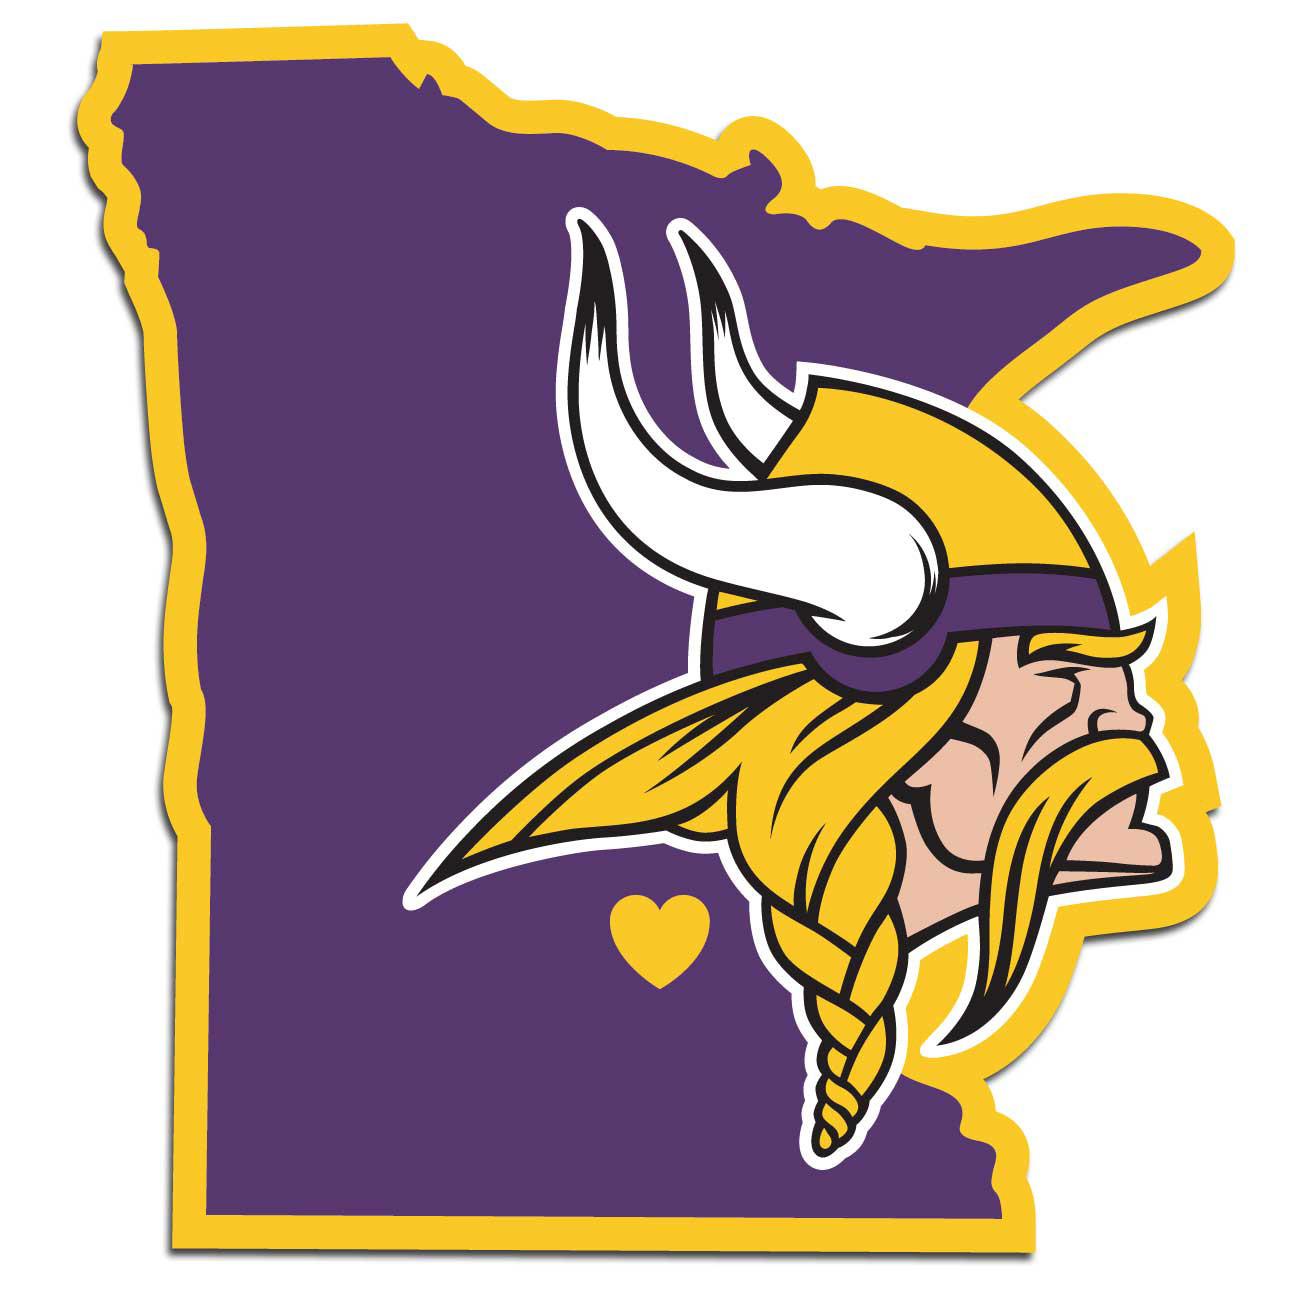 Minnesota map clipart svg free stock Minnesota Vikings Clipart Group with 72+ items svg free stock